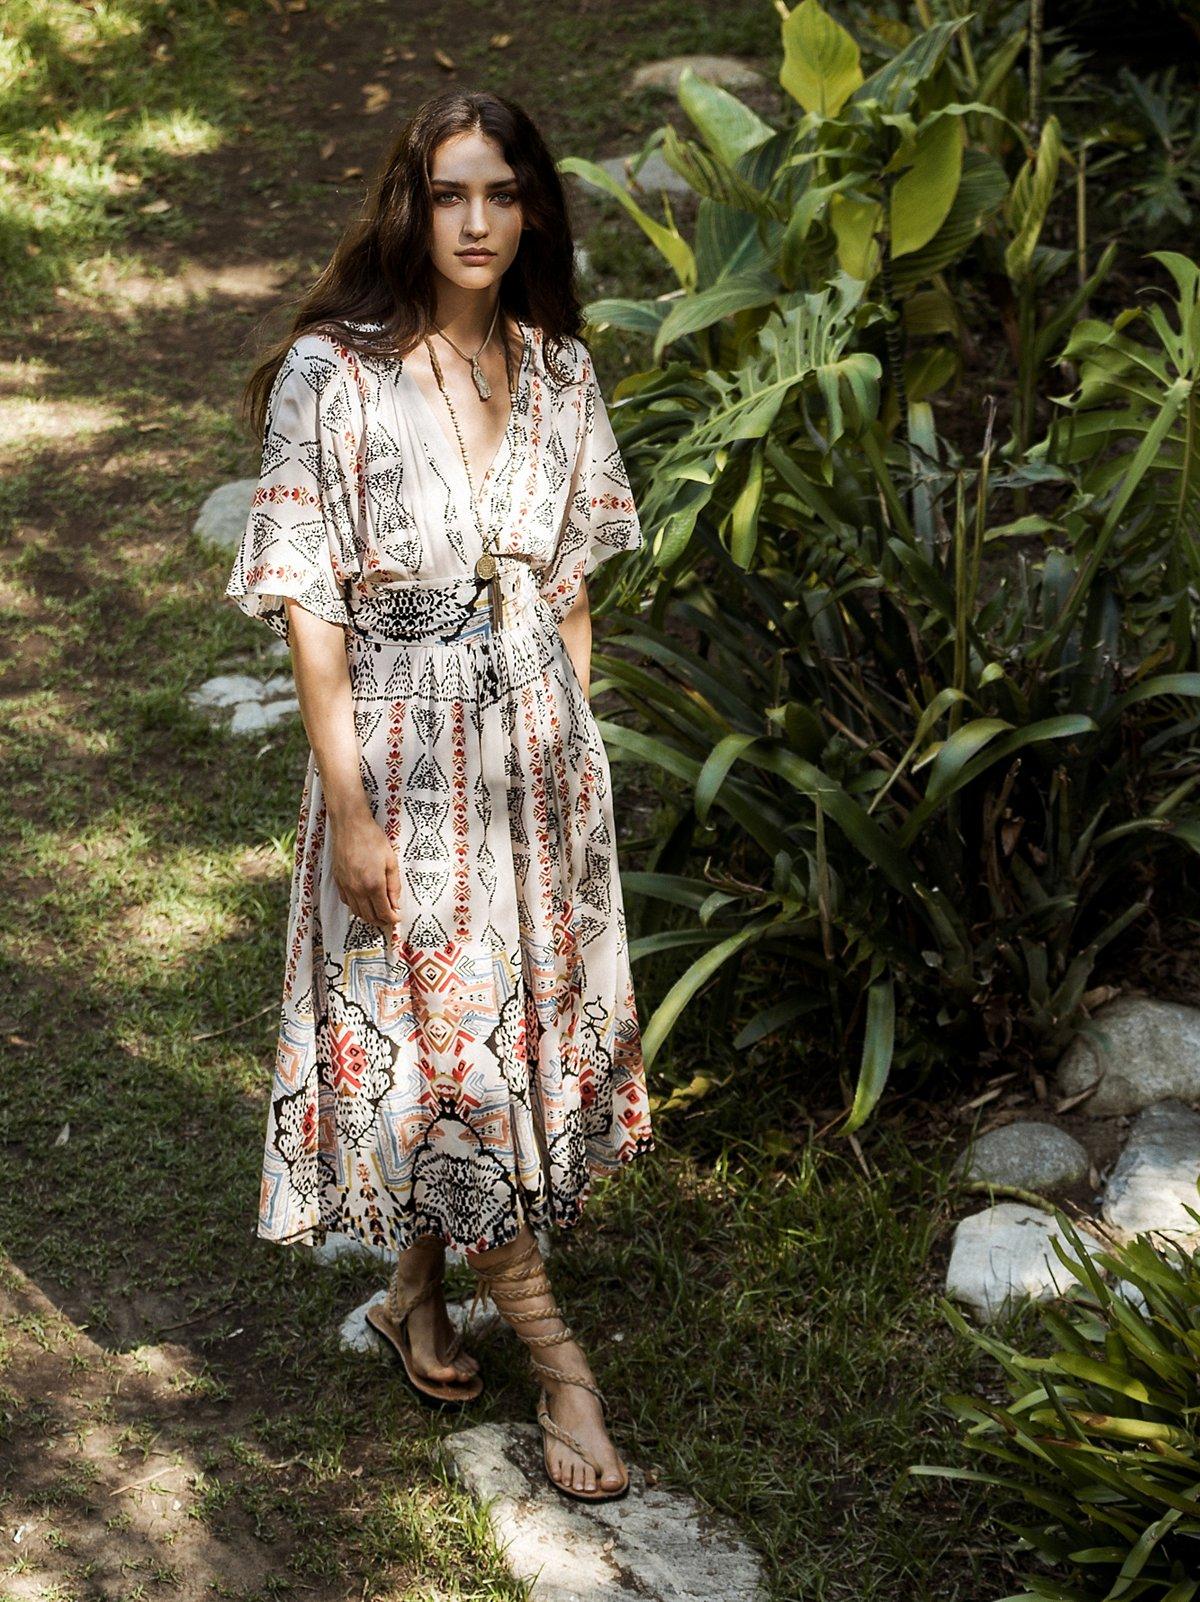 Wild Mountain和服式连衣裙